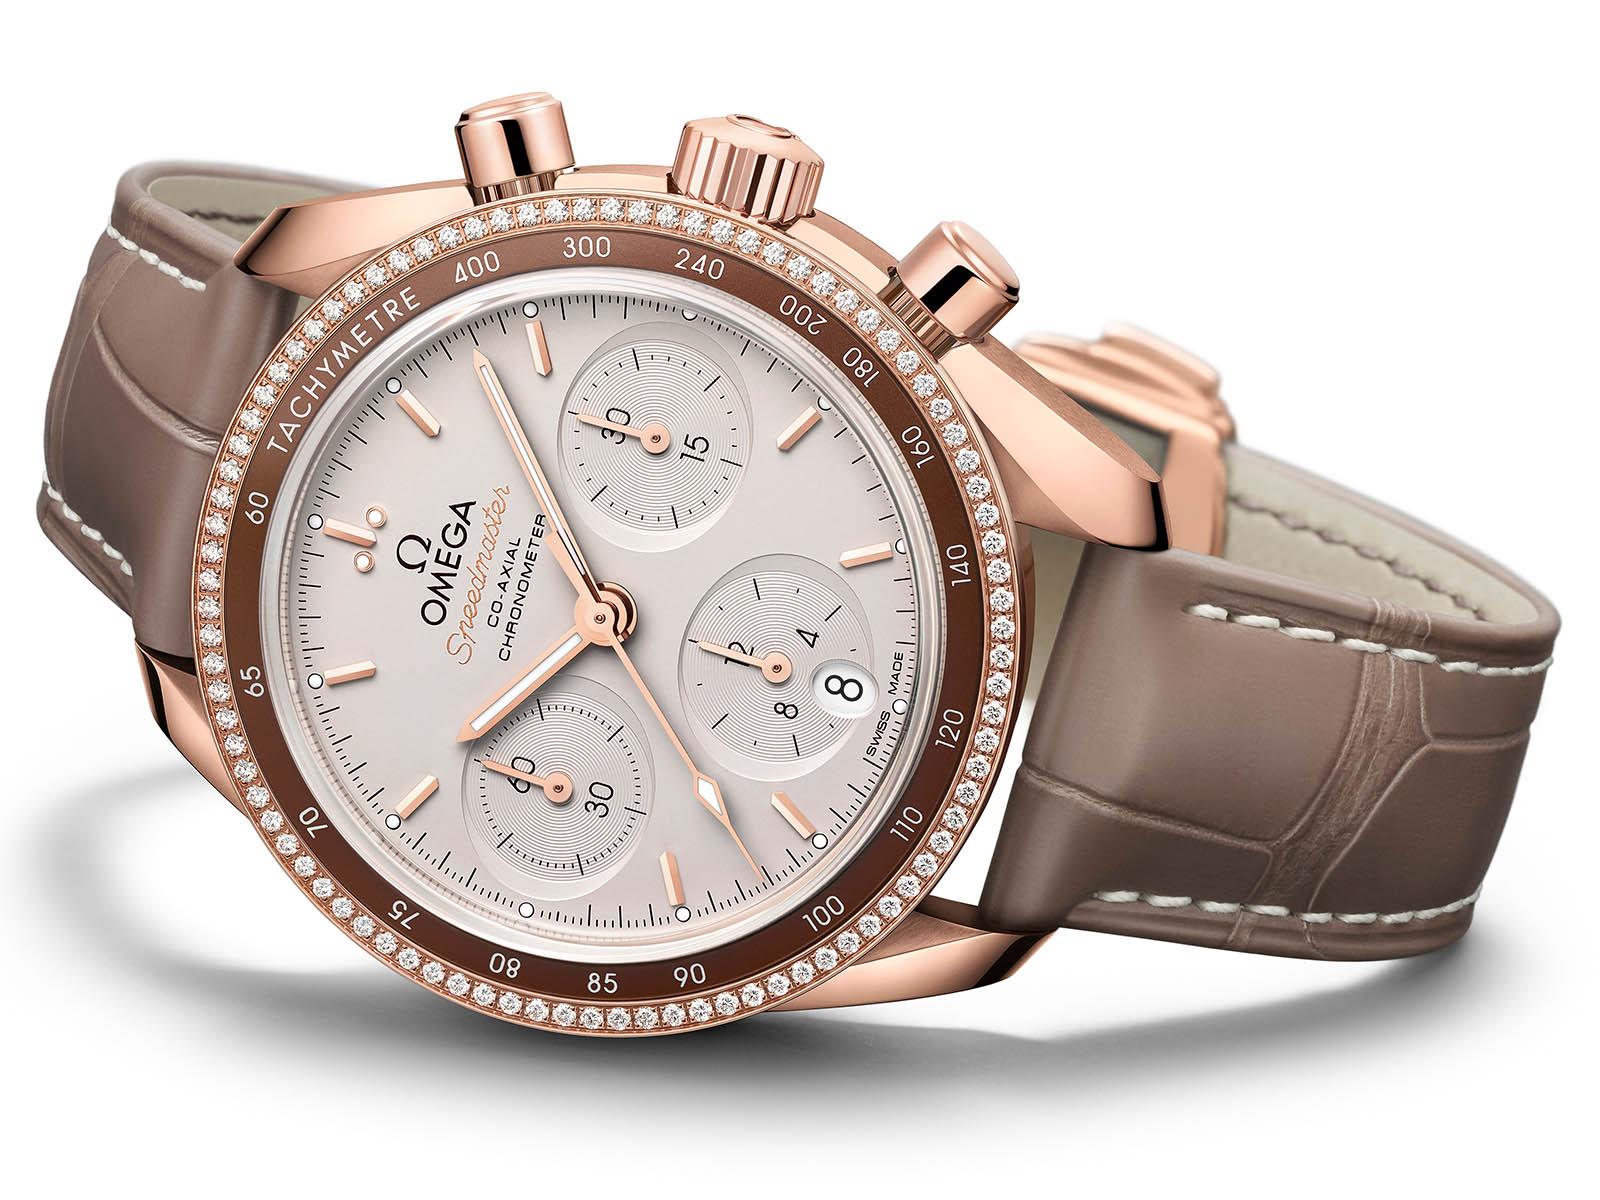 324-68-38-50-02-003-omega-speedmaster-38-co-axial-chronograph-38mm-sedna-gold-diamond-4.jpg